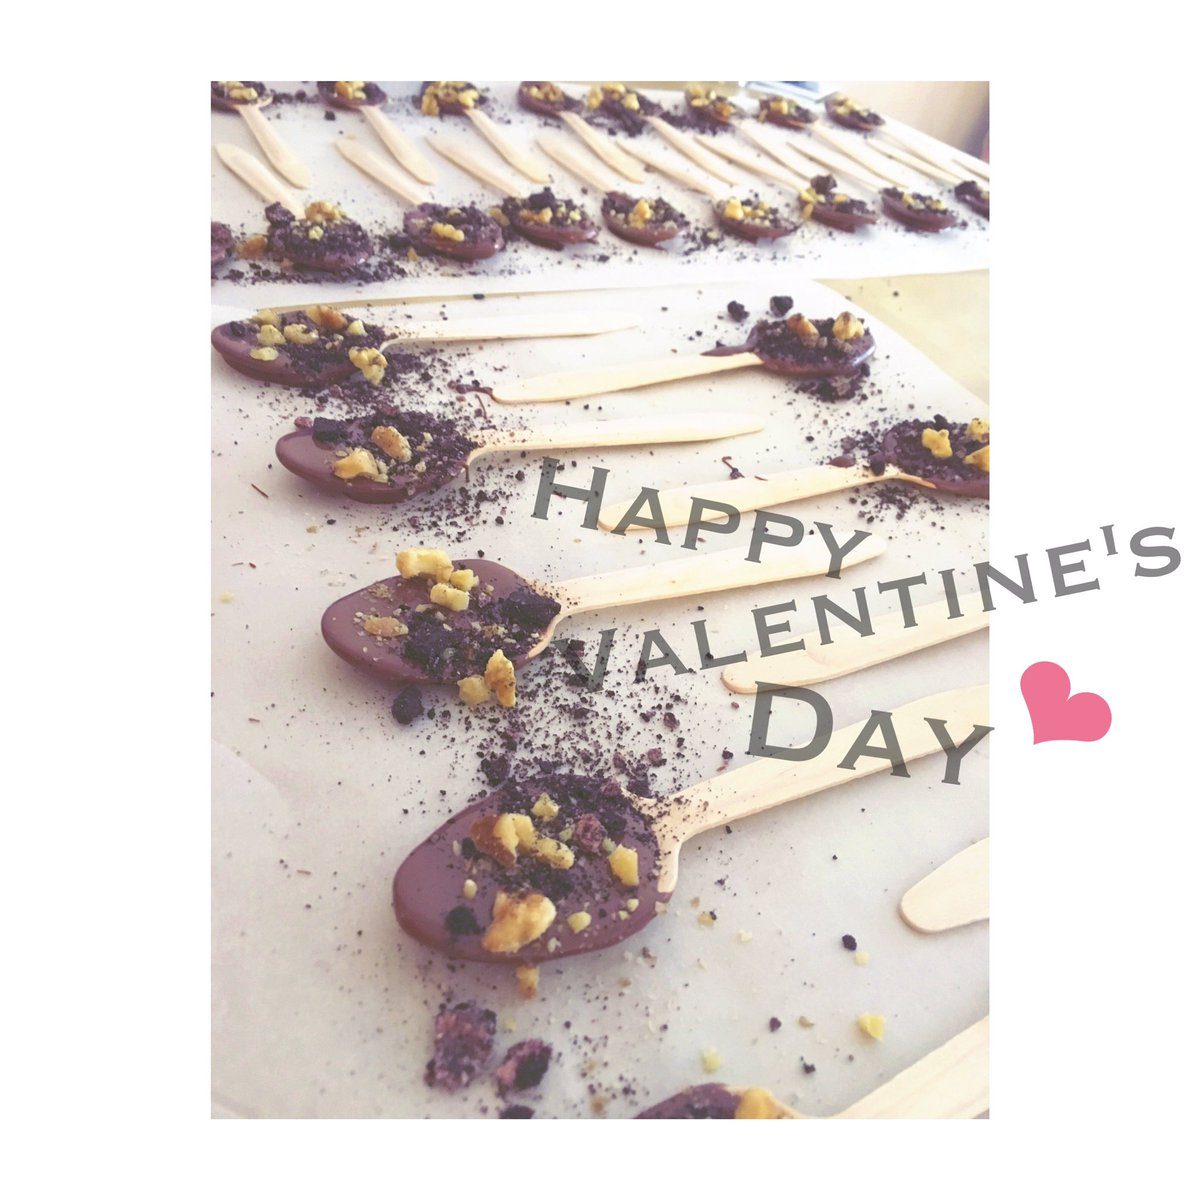 Happy Valentine's Day❣️ 私はいつもお世話になっている方々に、普段の感…